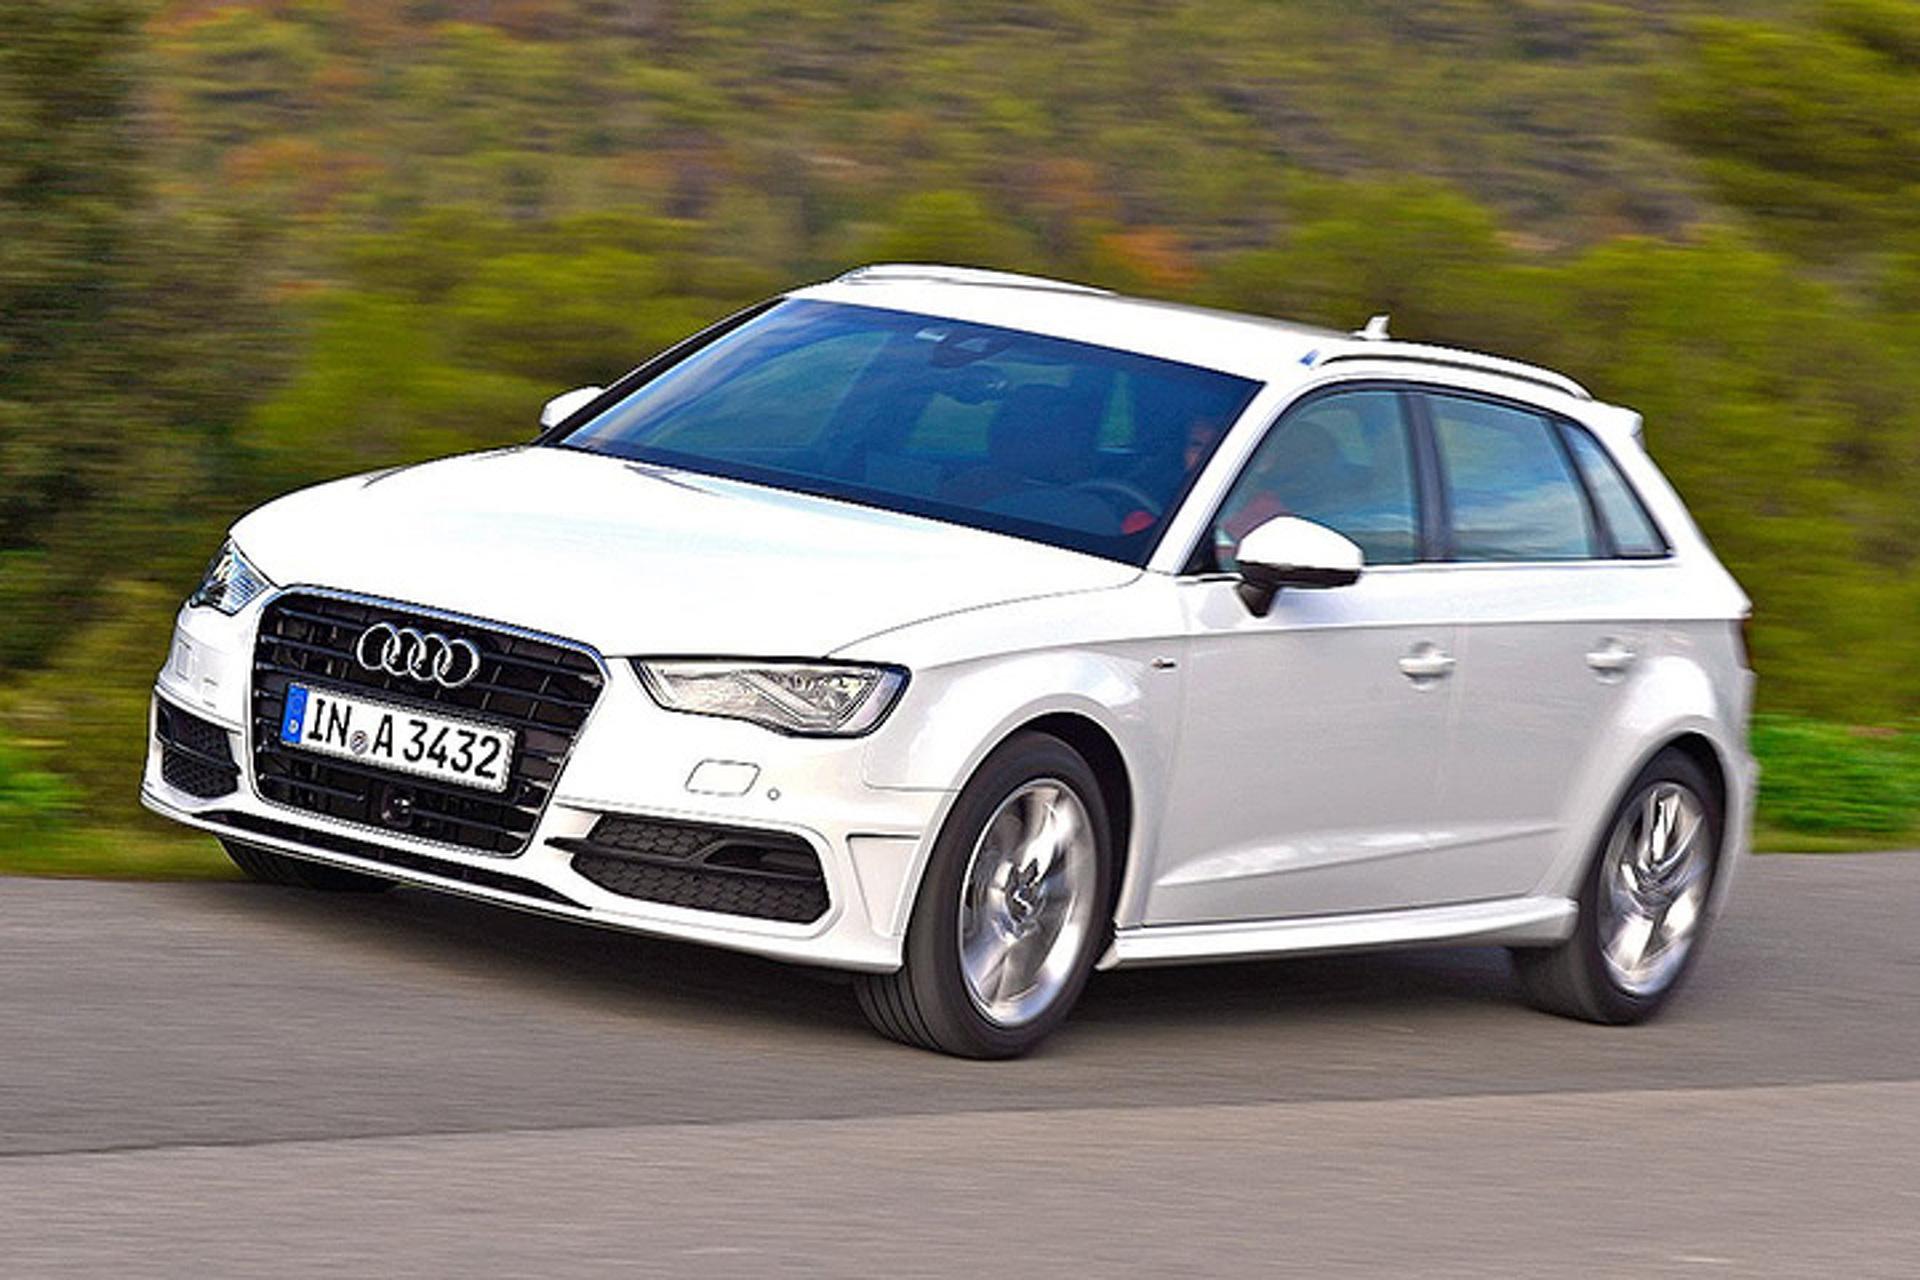 Making Sense of the Volkswagen Diesel Dilemma